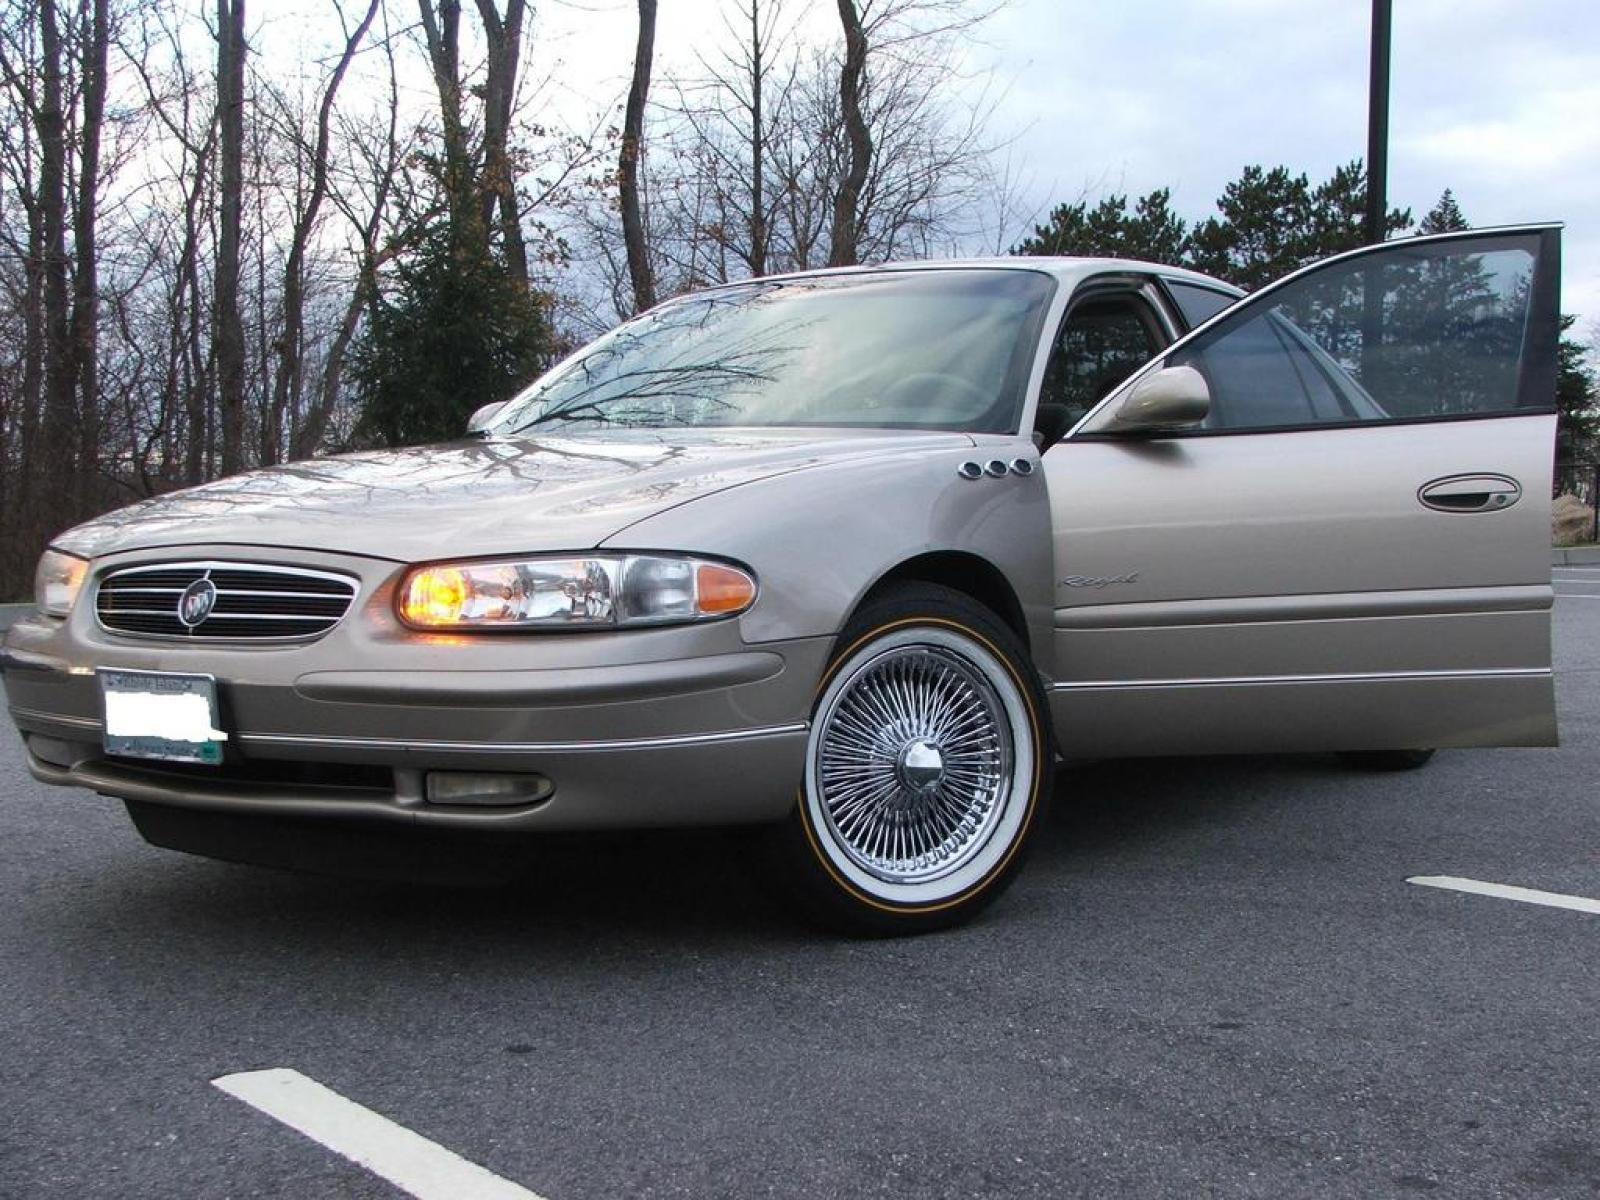 800 1024 1280 1600 origin 1999 buick regal